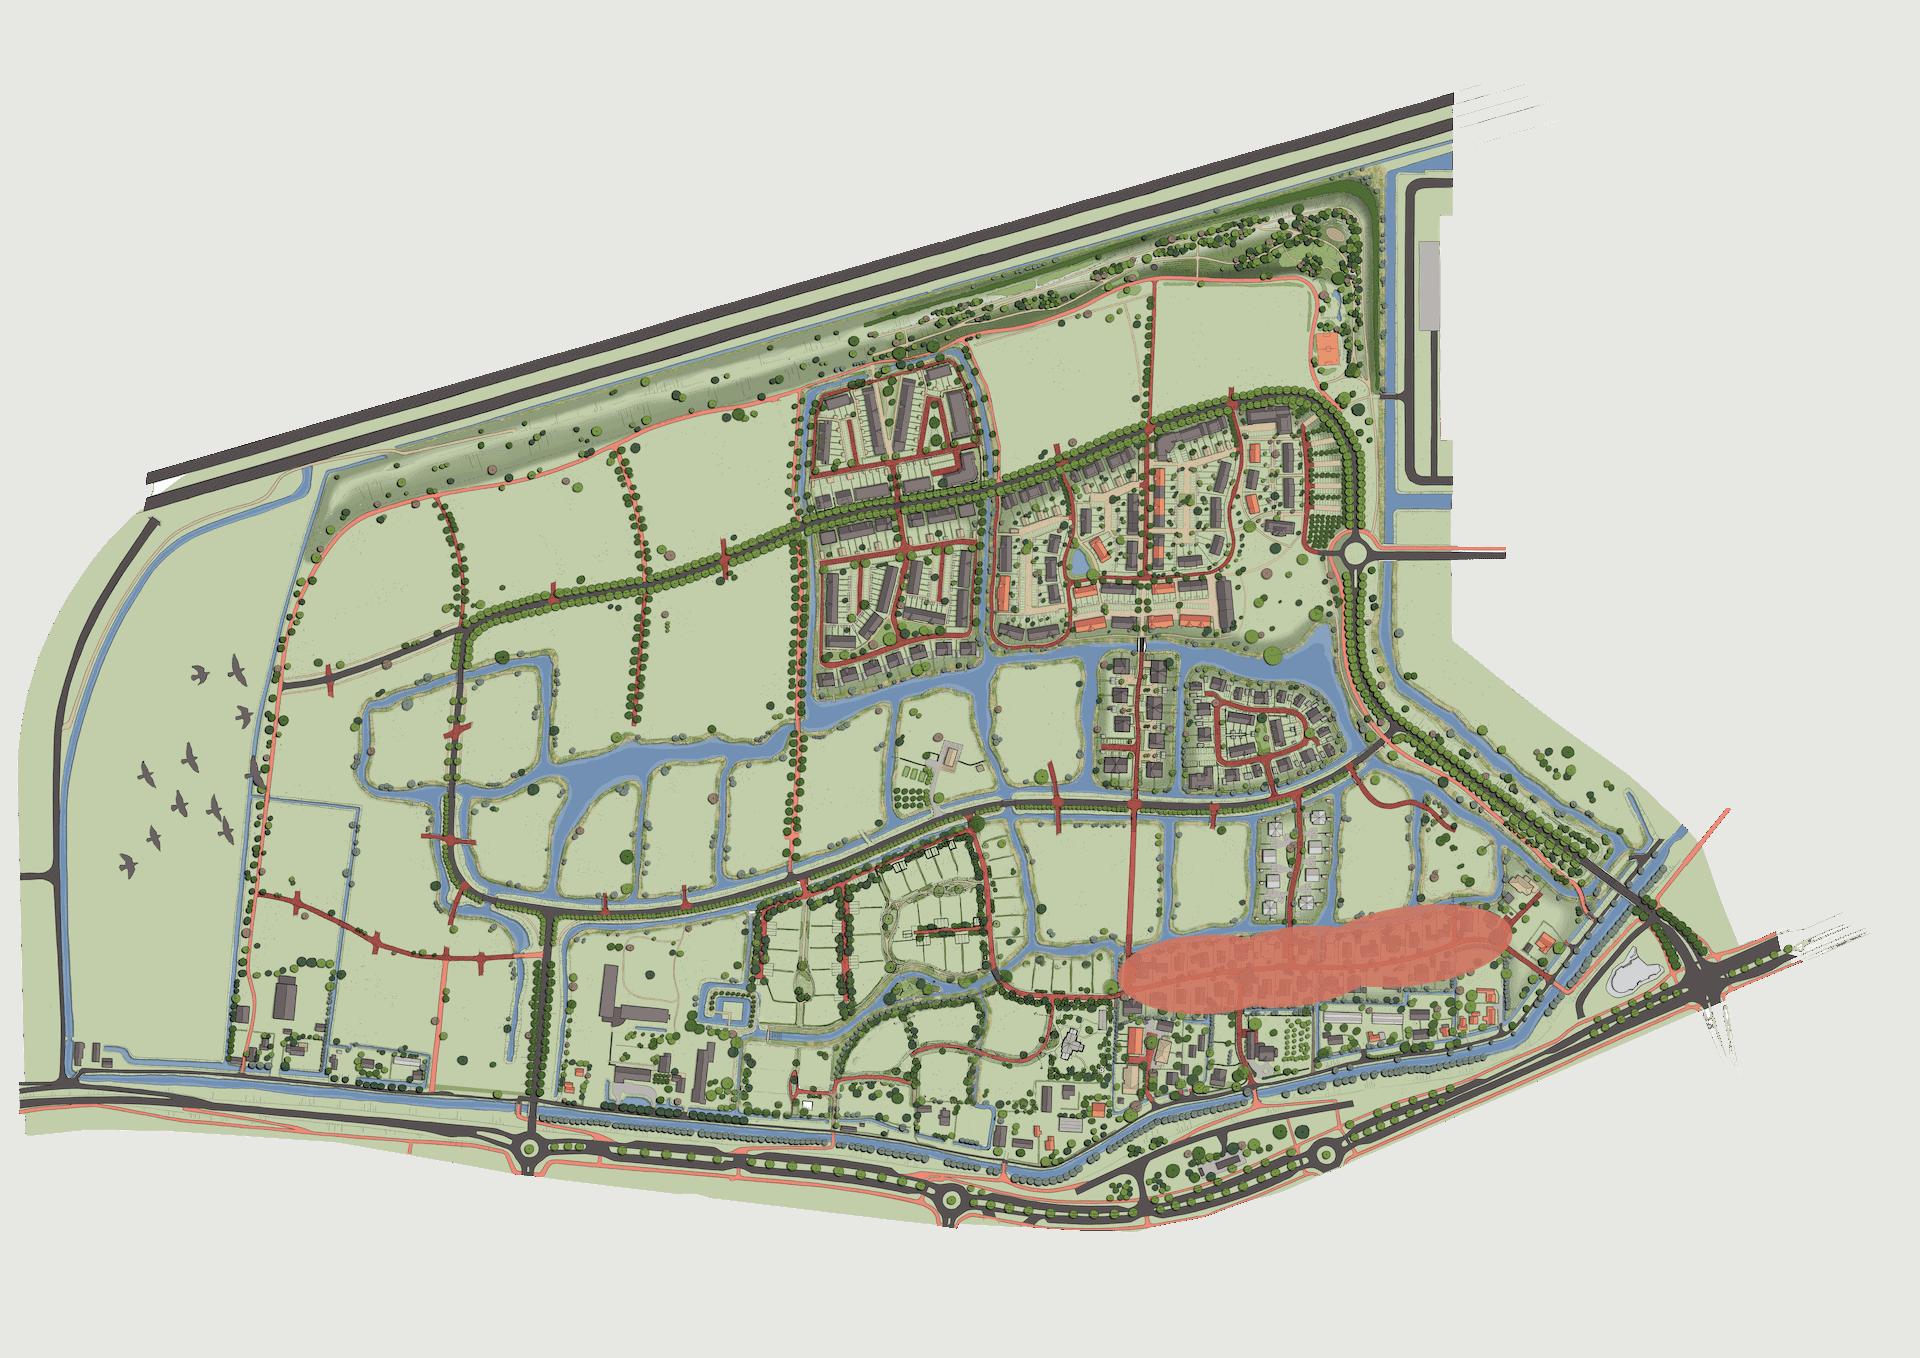 Plankaart Tweede Weverskade 2021